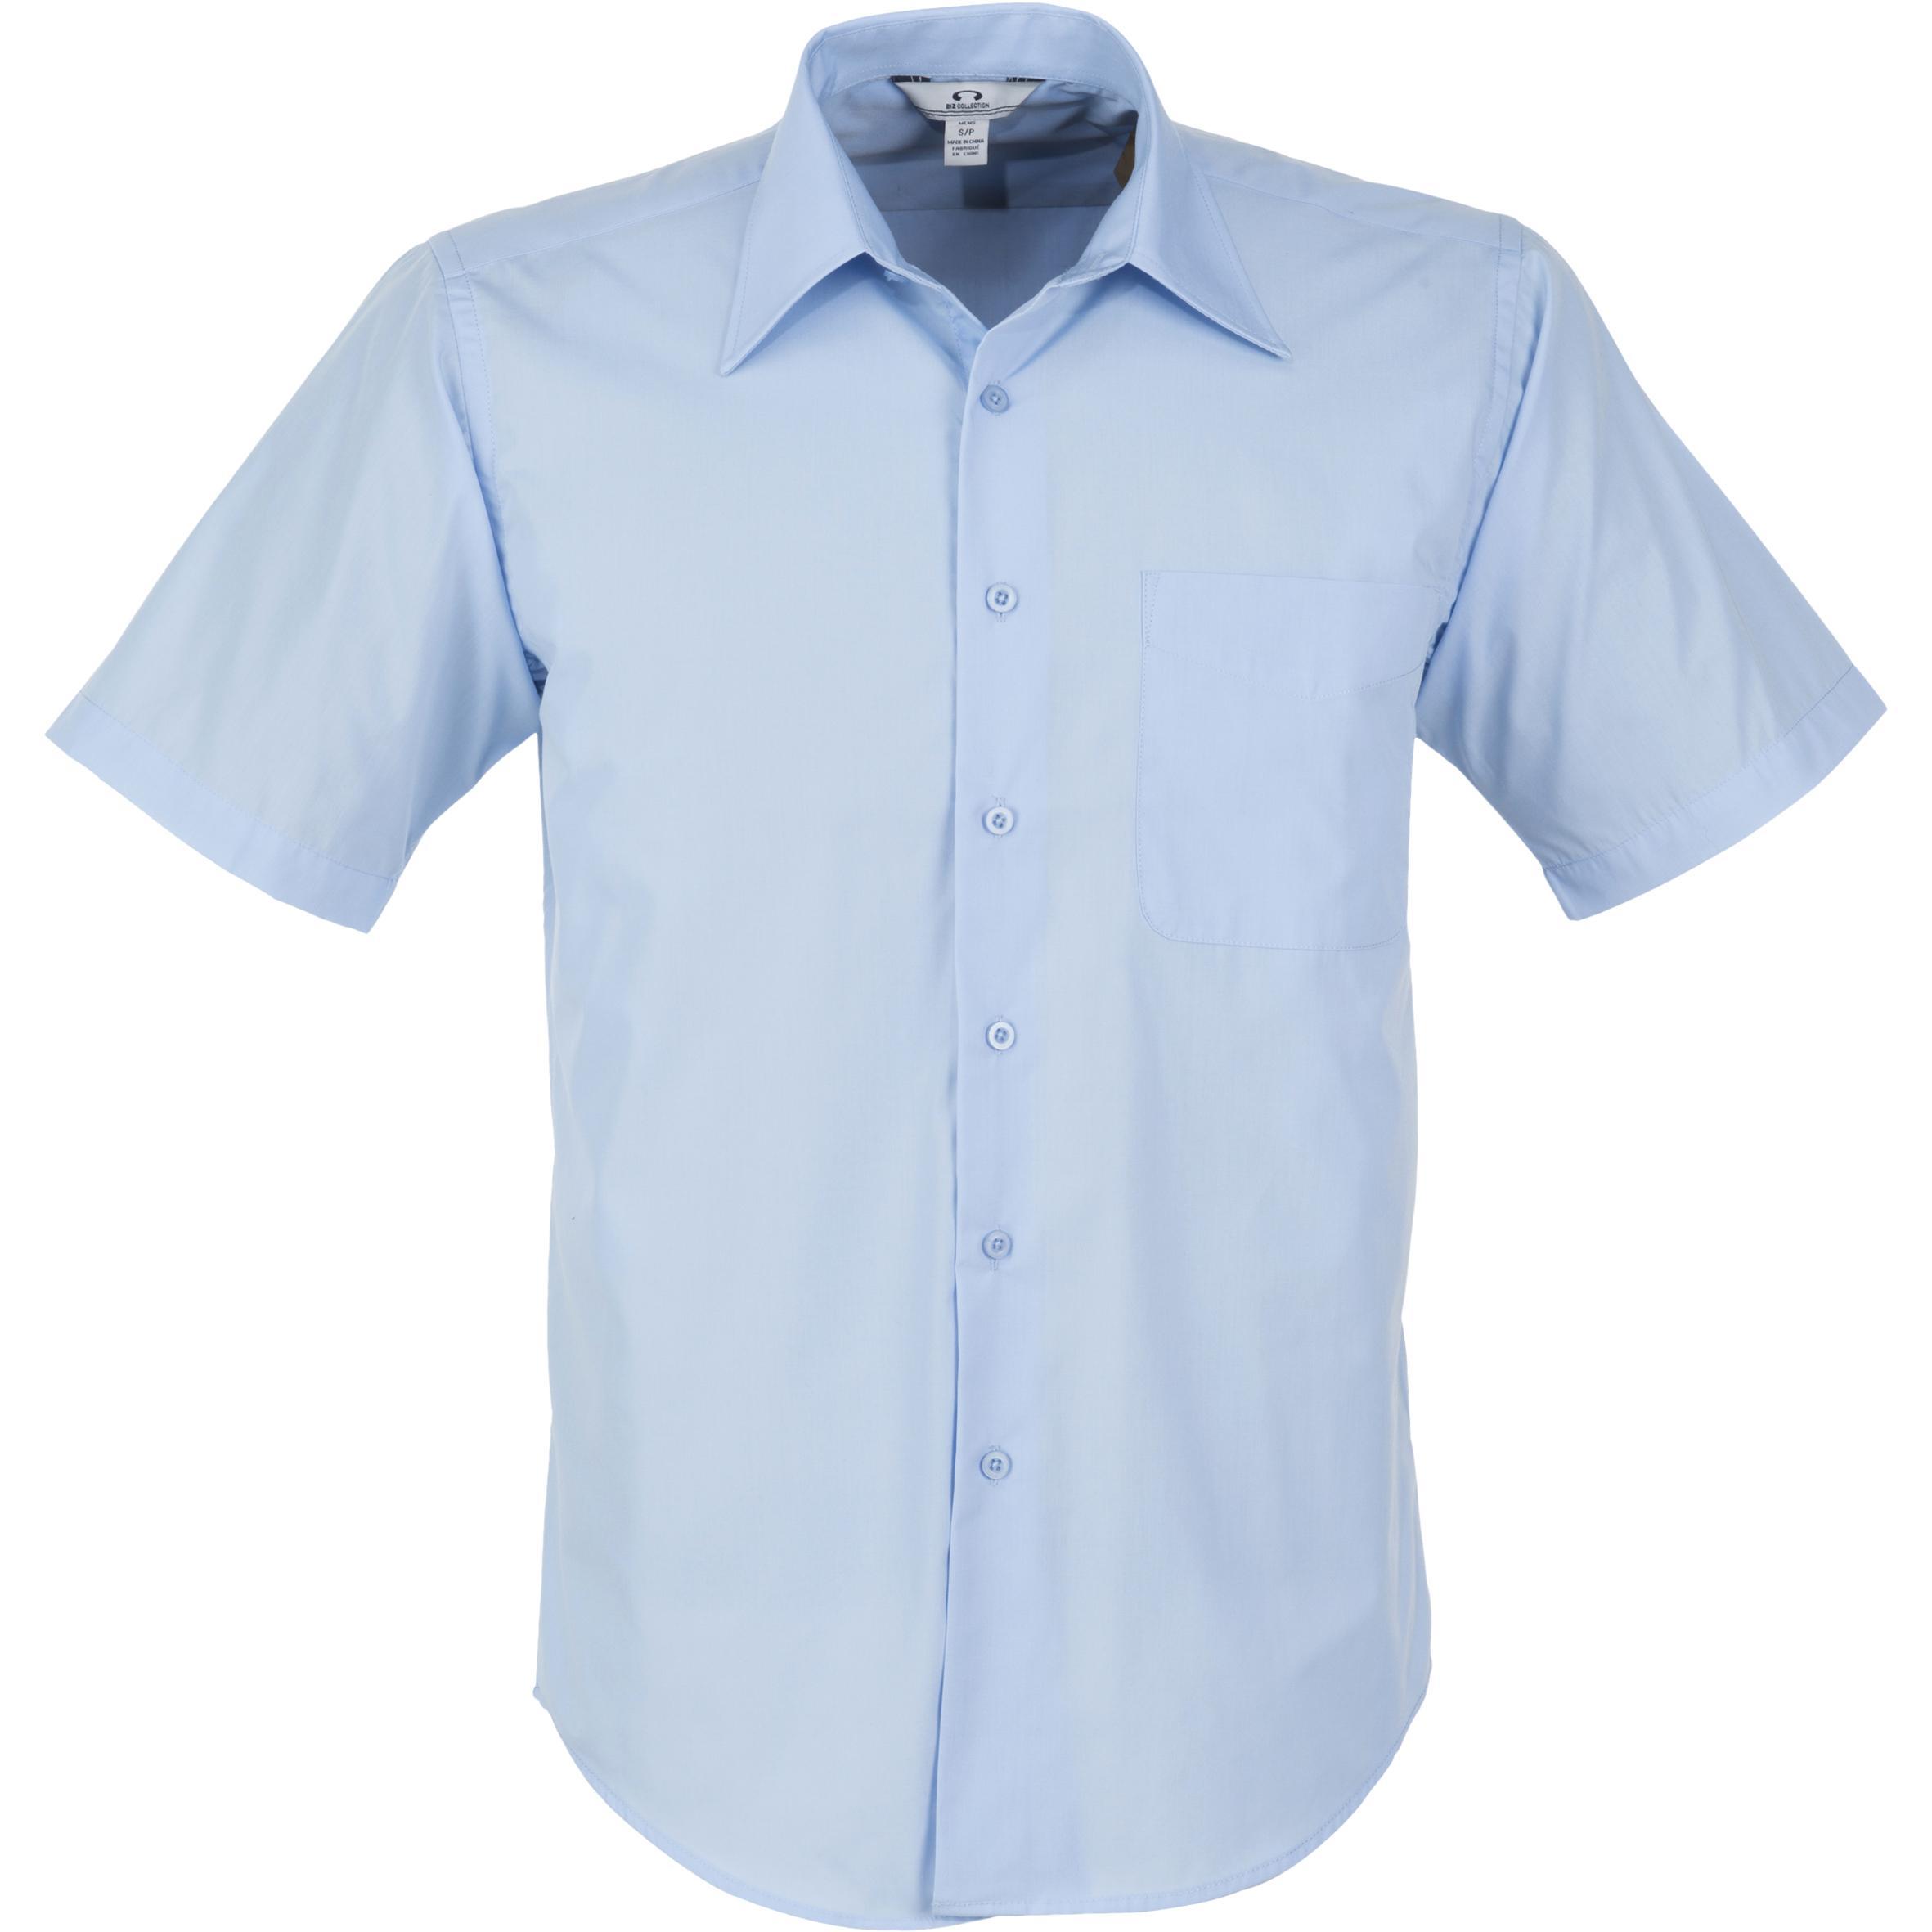 Mens Short Sleeve Metro Shirt - Light Blue Only